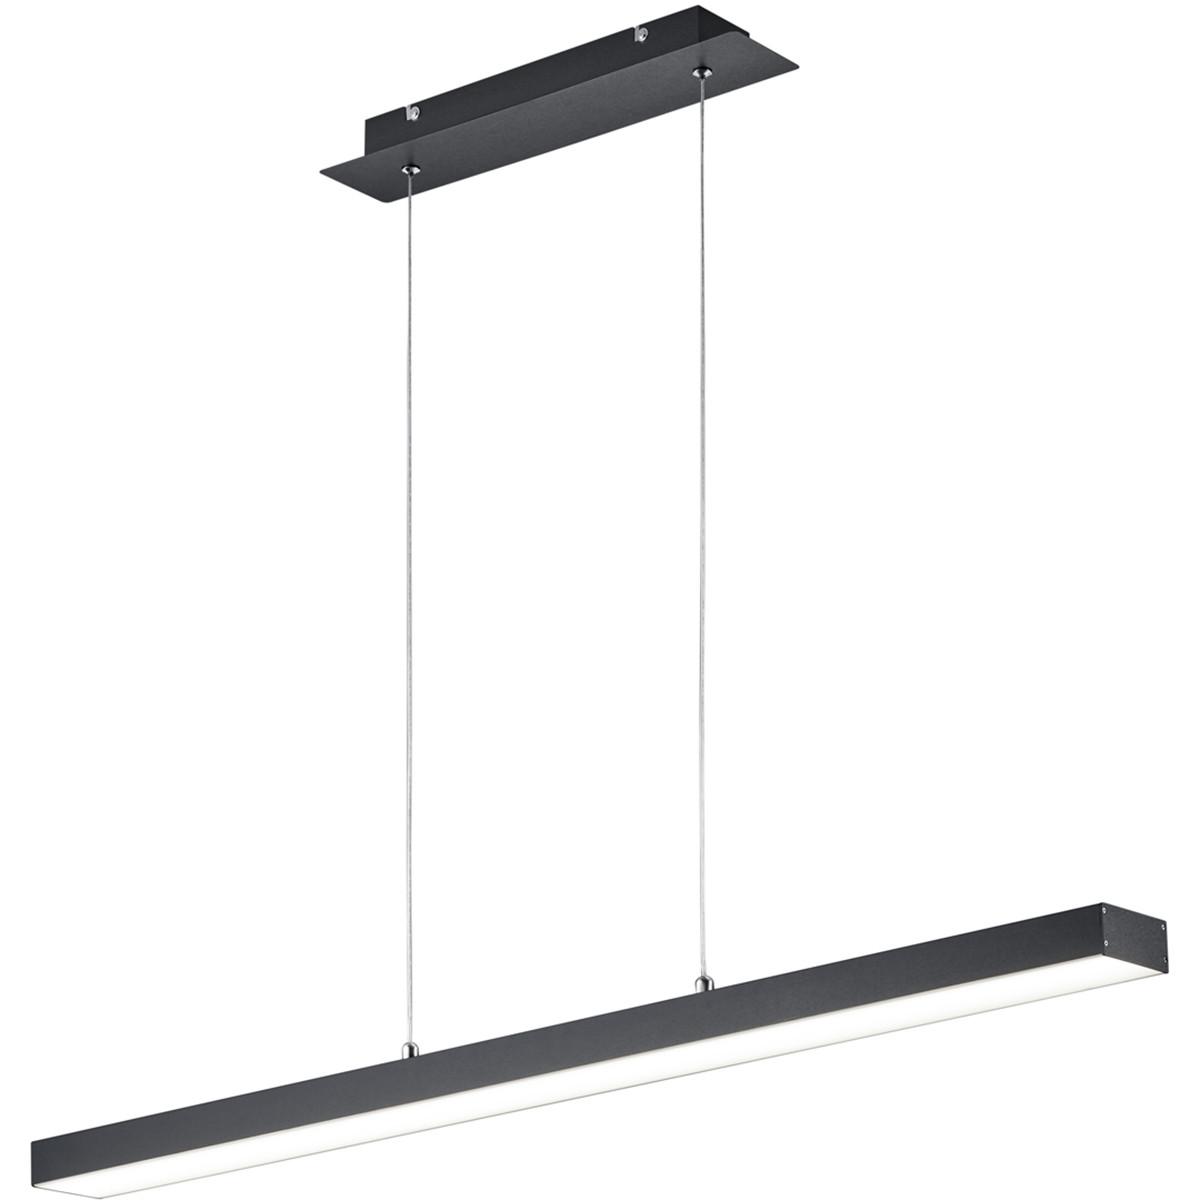 LED Hanglamp - Trion Agina - 18W - Aanpasbare Kleur - Dimbaar - Rechthoek - Mat Zwart - Aluminium